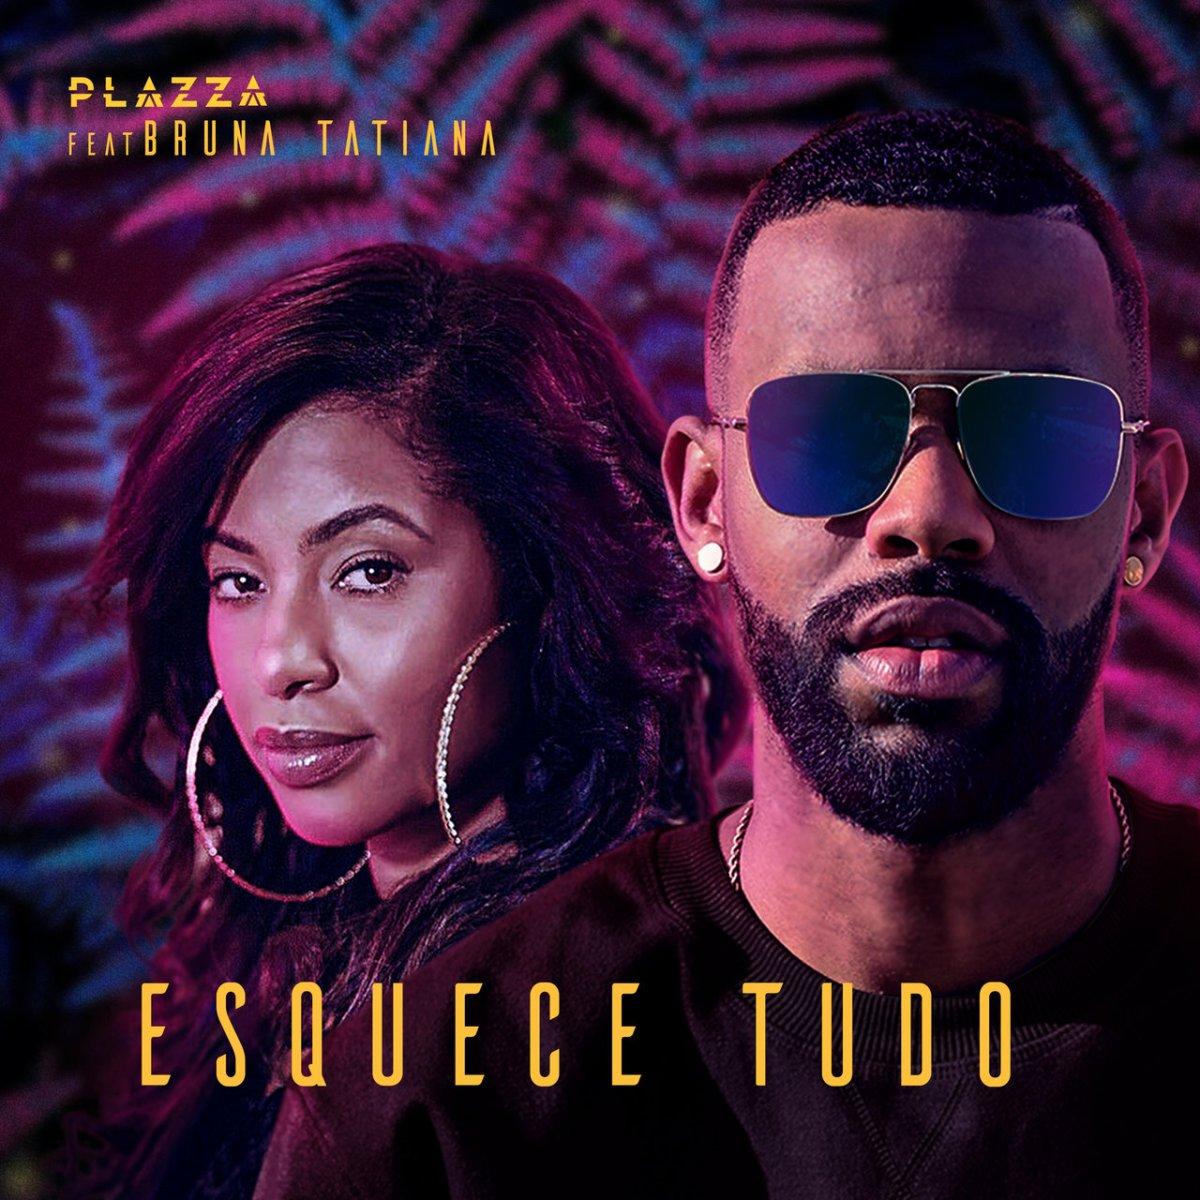 Plazza - Esquece Tudo (ft. Bruna Tatiana) (Cover)